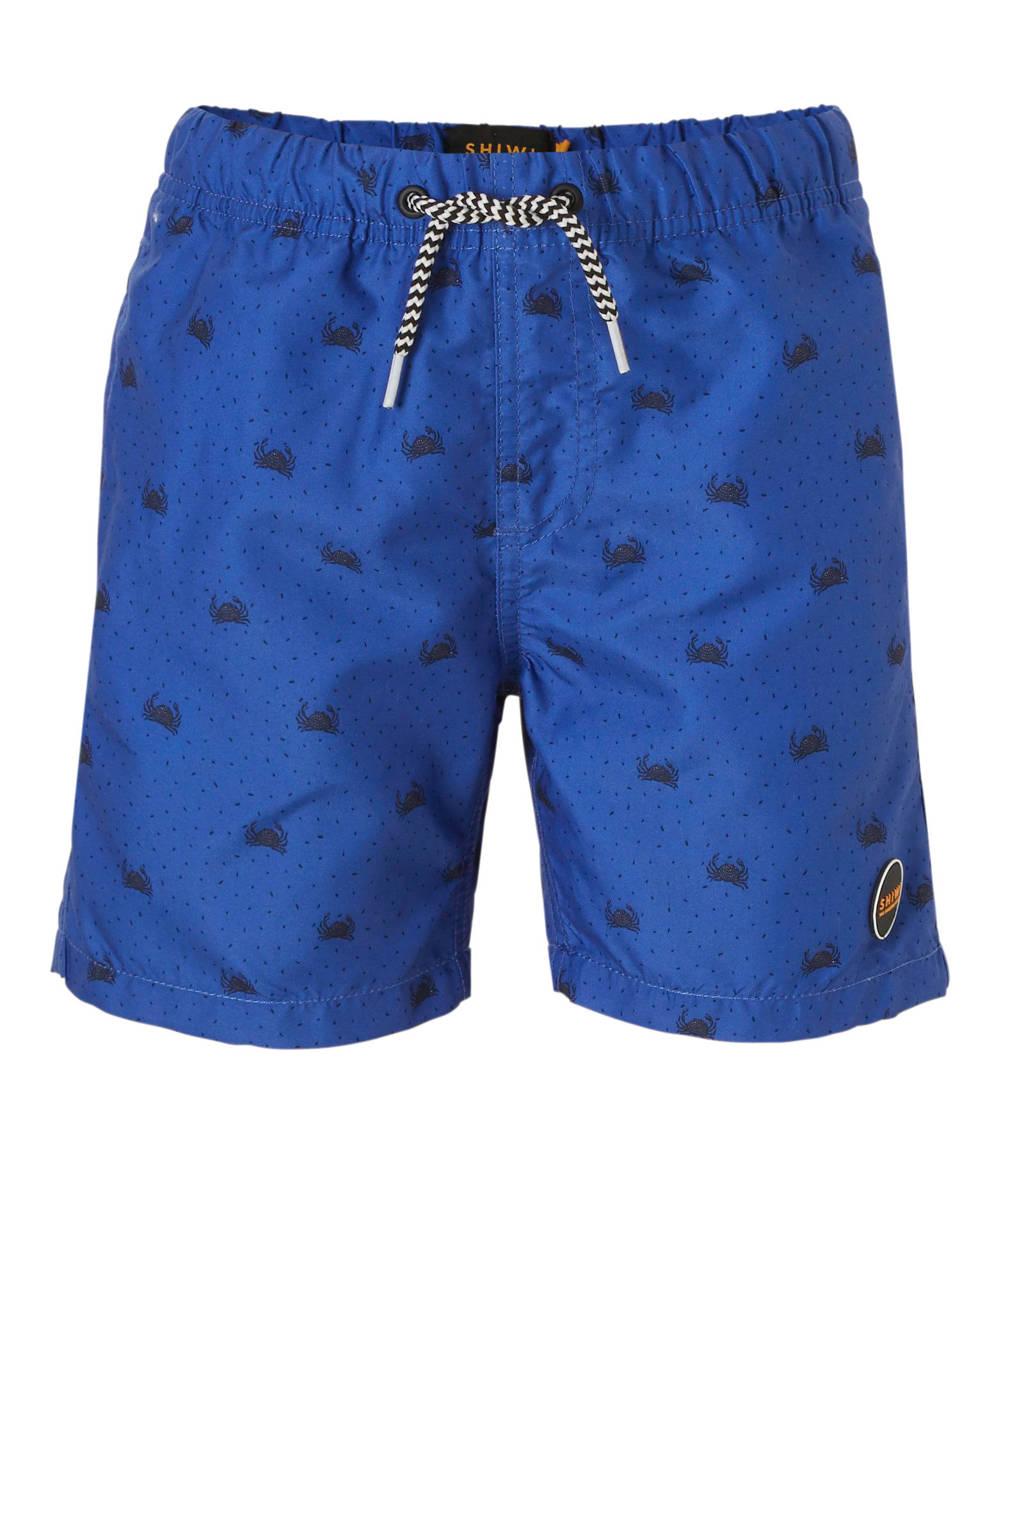 b61c8b470f9f33 Shiwi zwemshort met all over print blauw, Blauw/marine